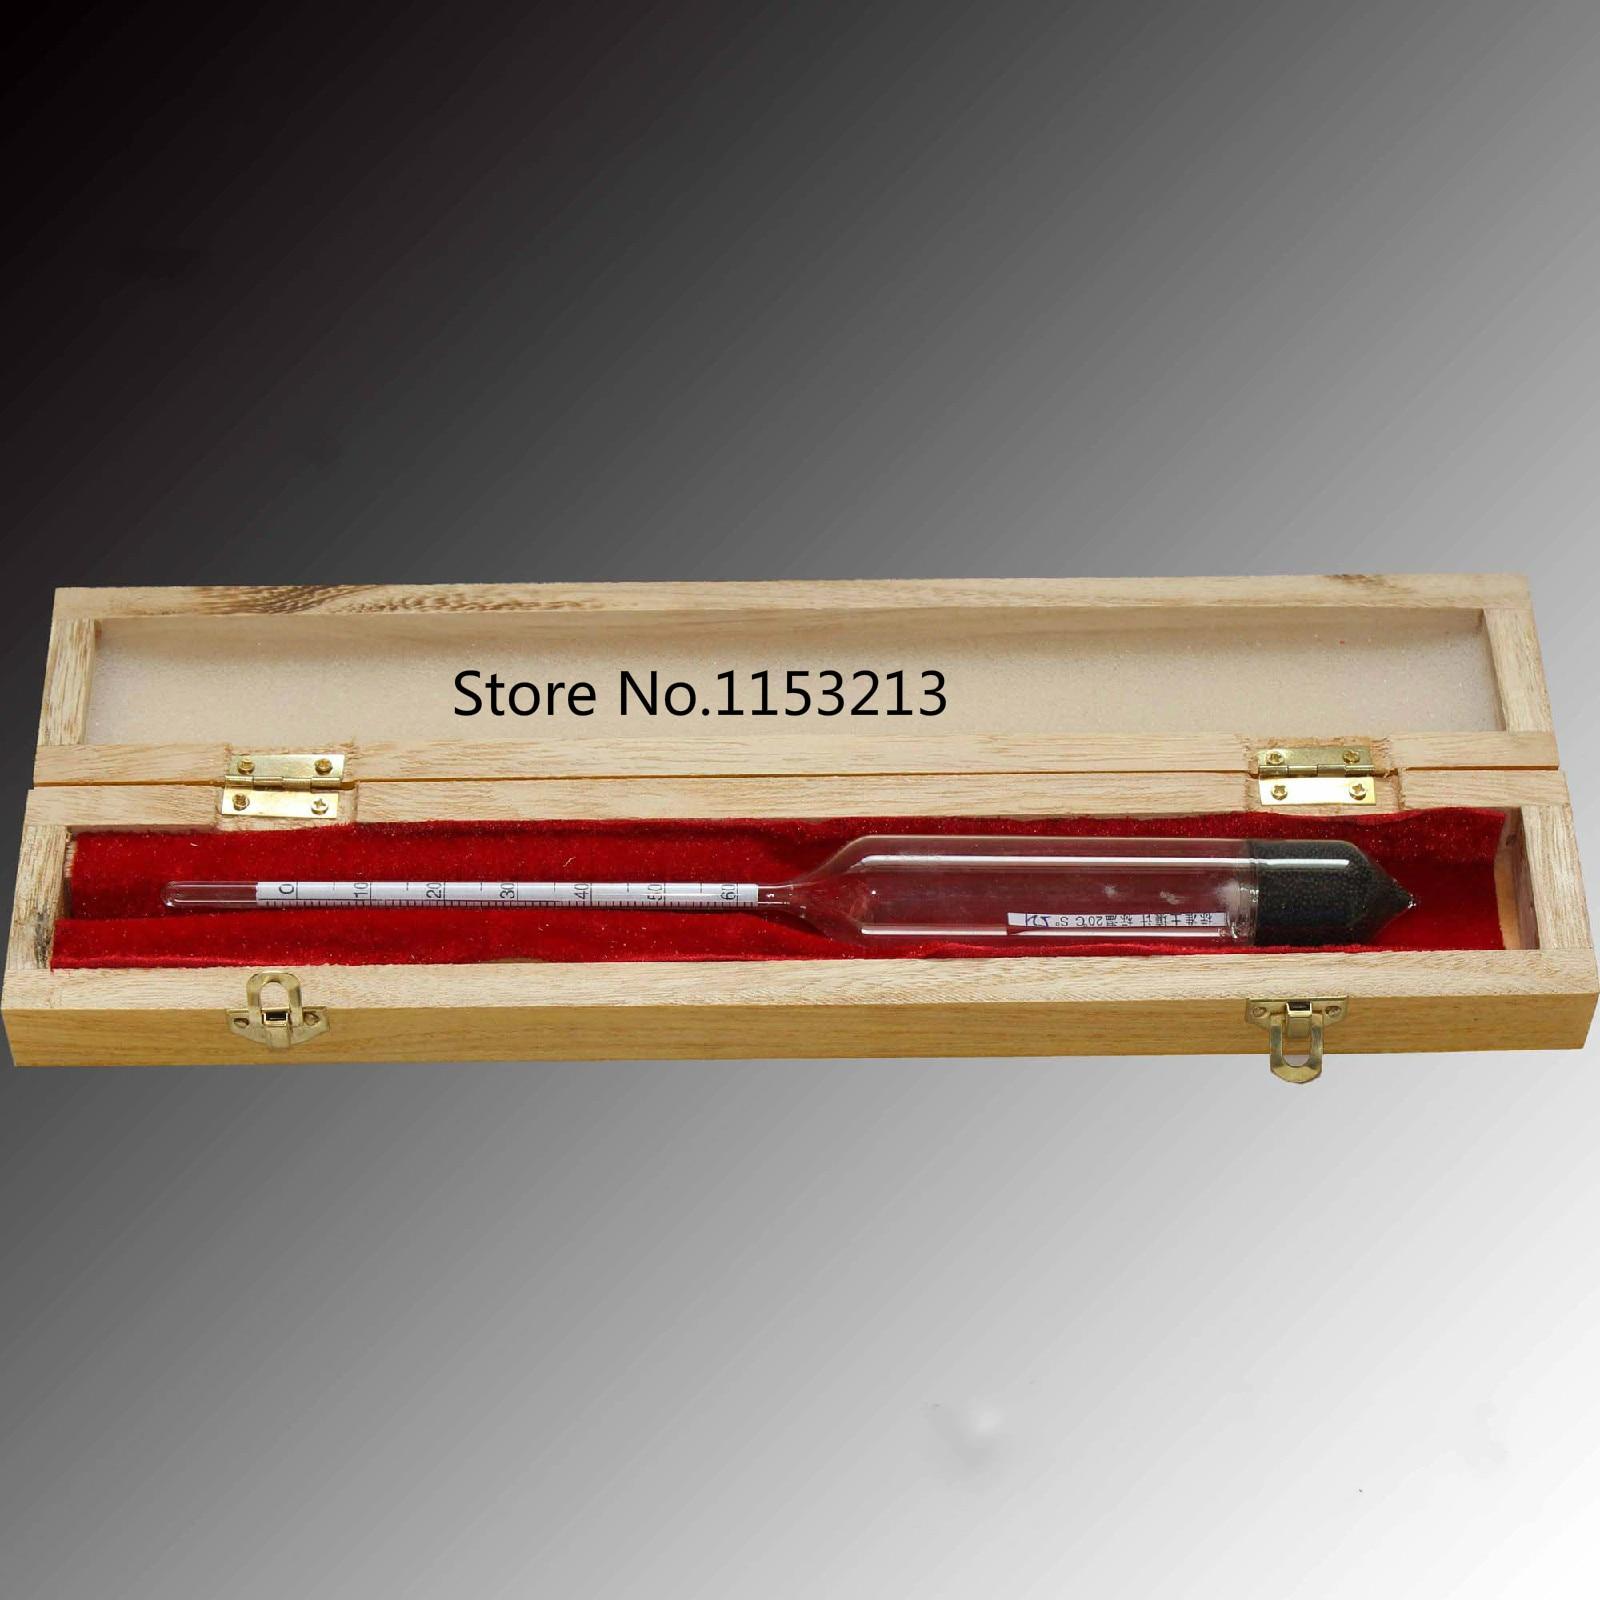 A soil densitometer hydrometer soil analyzer TM-85 standard soil hydrometer 0-60 wooden cylinder length of 25cm цена